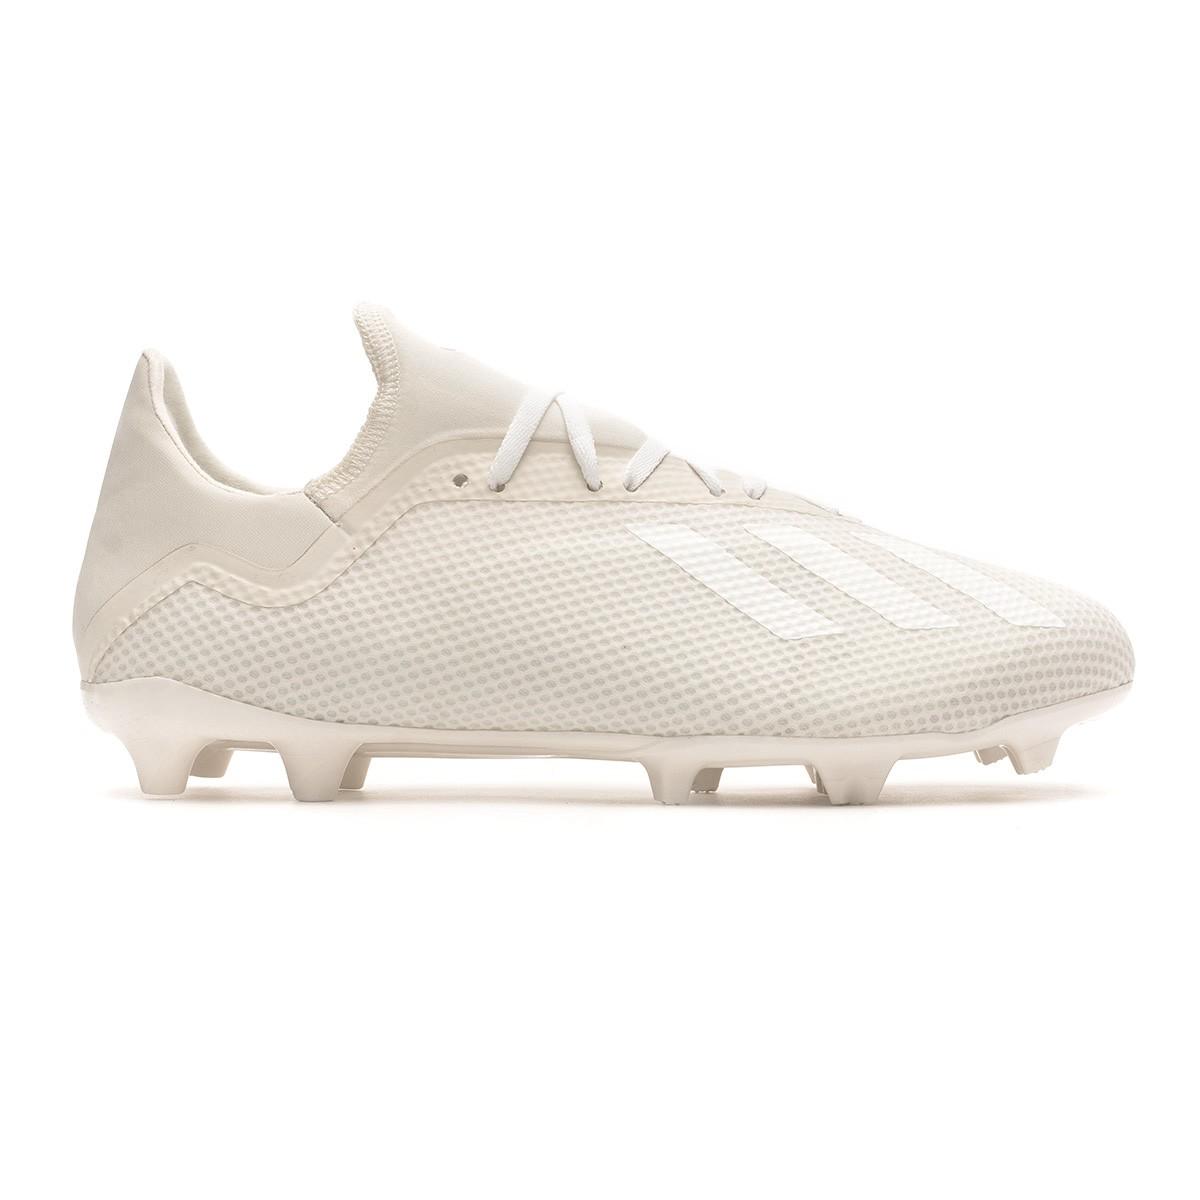 335ff81ffca Football Boots adidas X 18.3 FG Off white-White-Core black - Football store  Fútbol Emotion